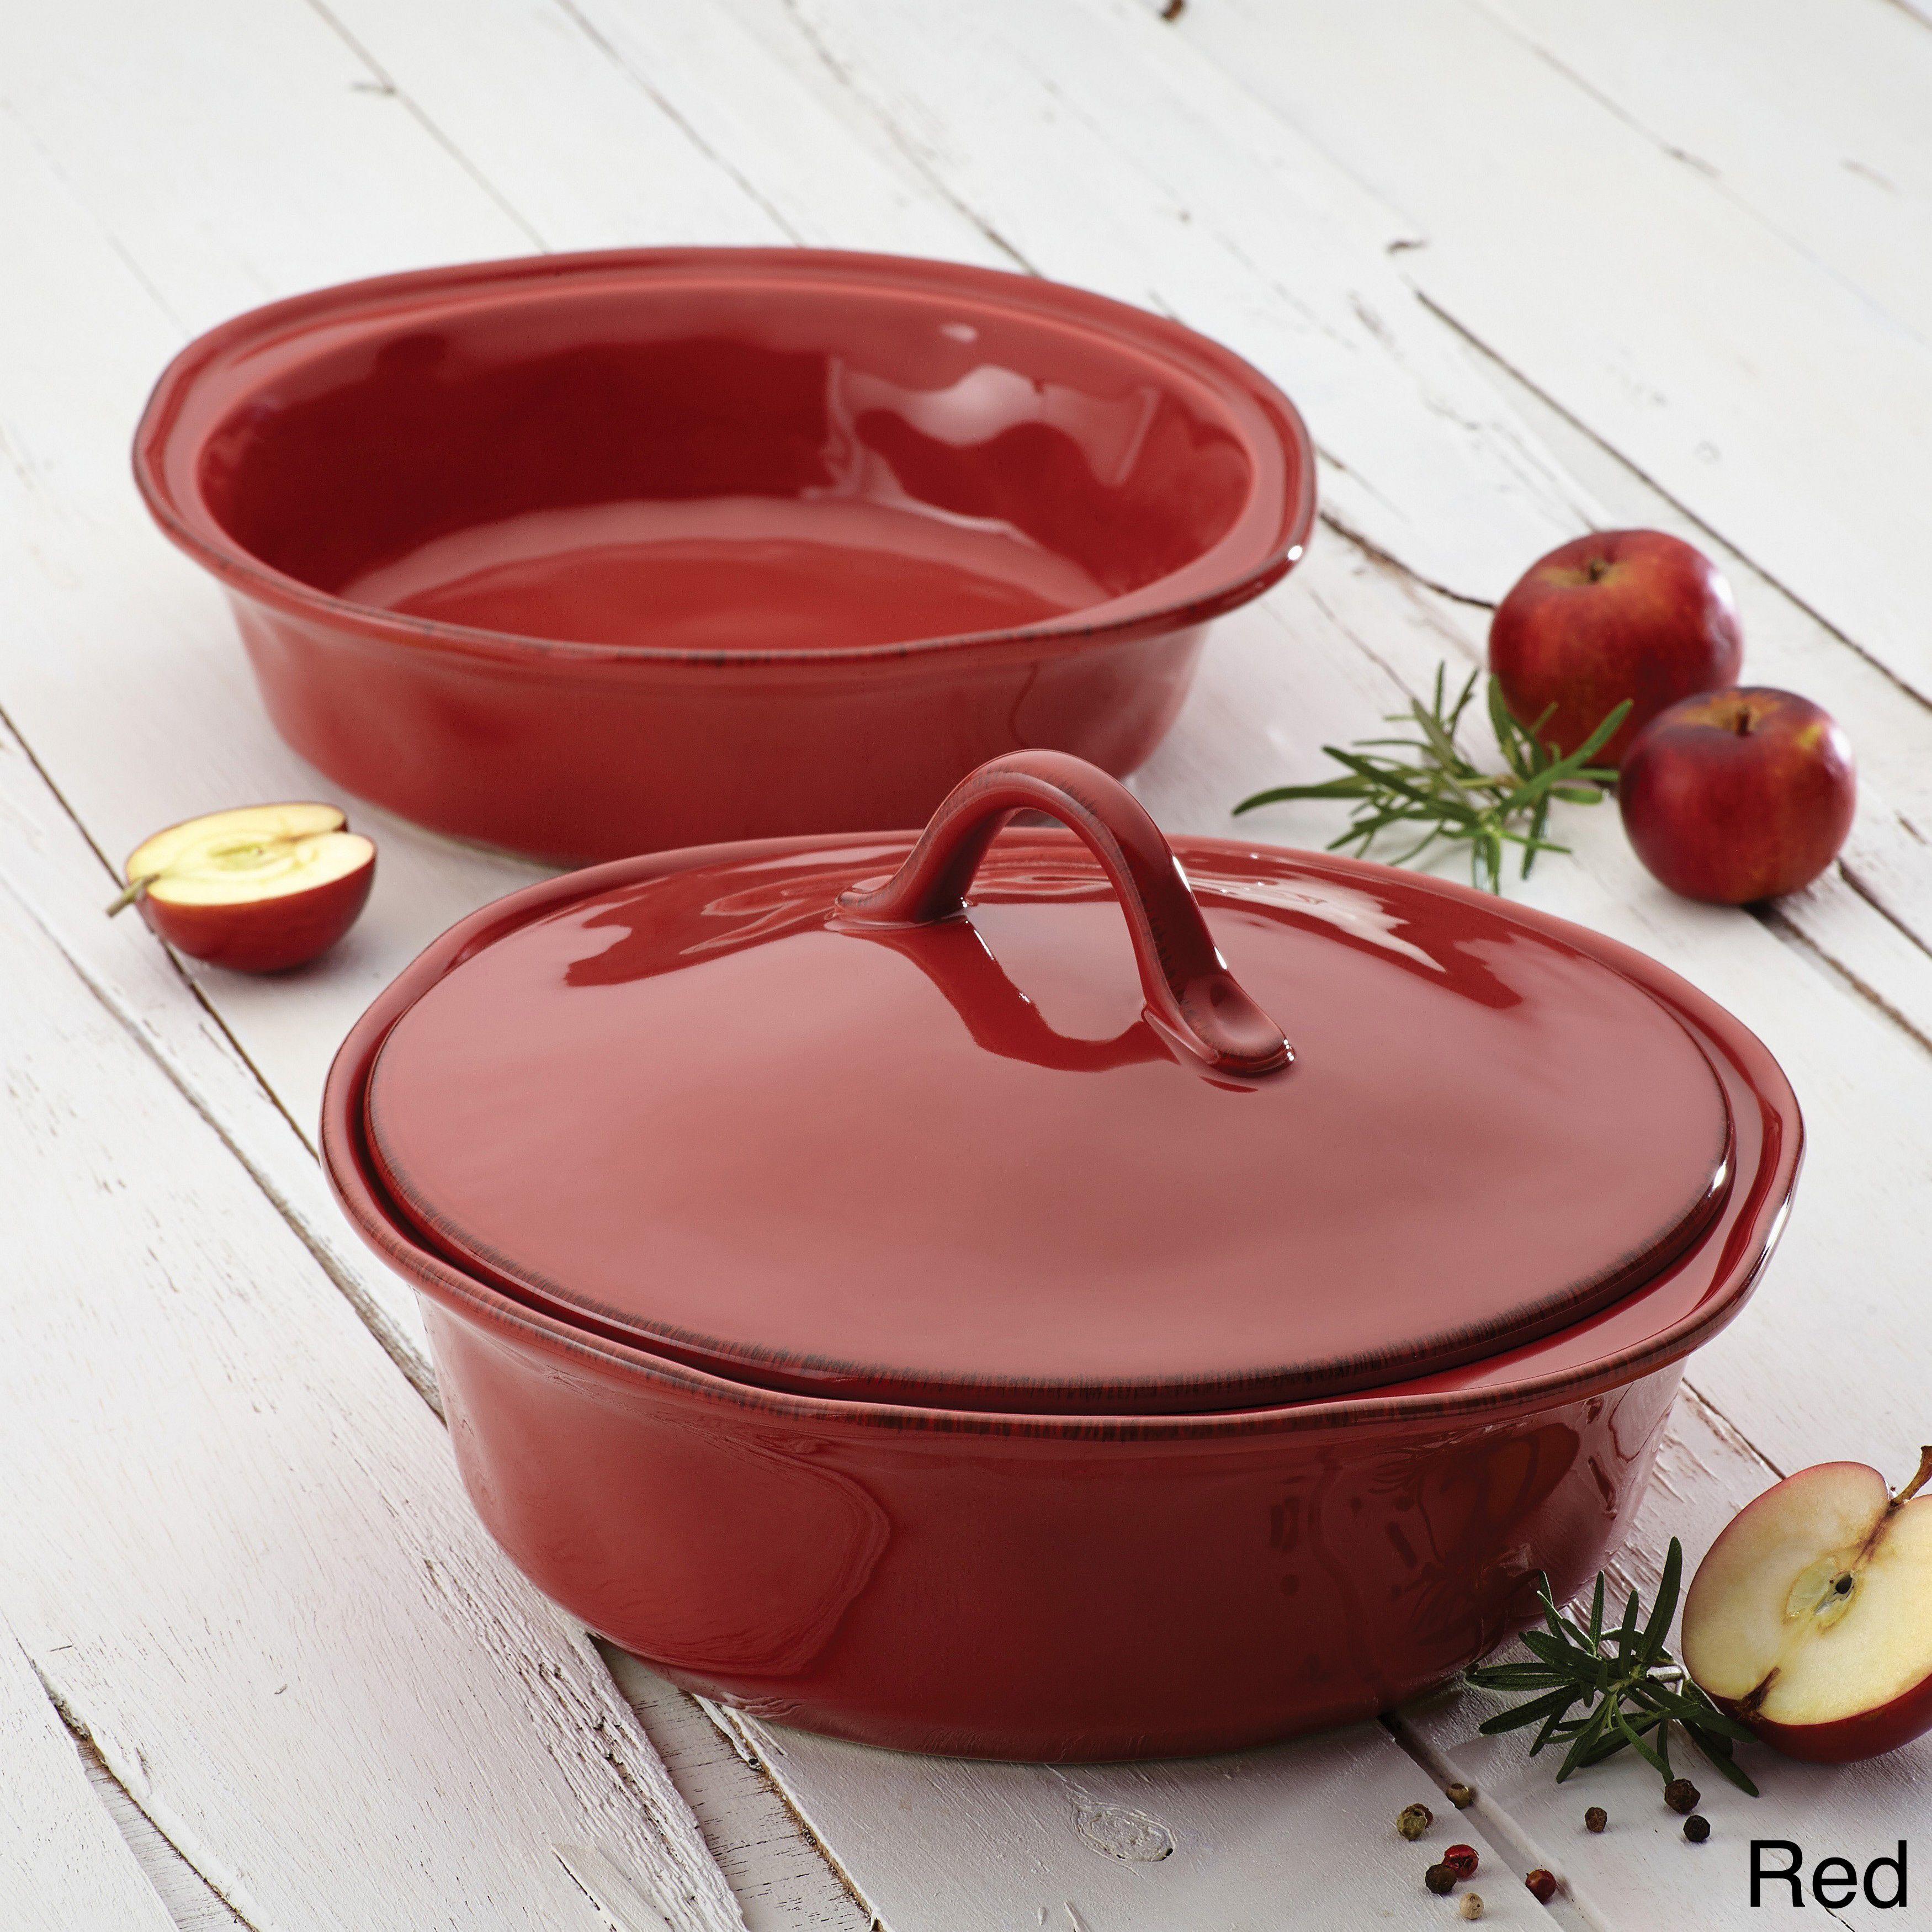 Rachael Ray Cucina Stoneware 3 Piece Cranberry Red Round Casserole And Lid Set Casserole Set